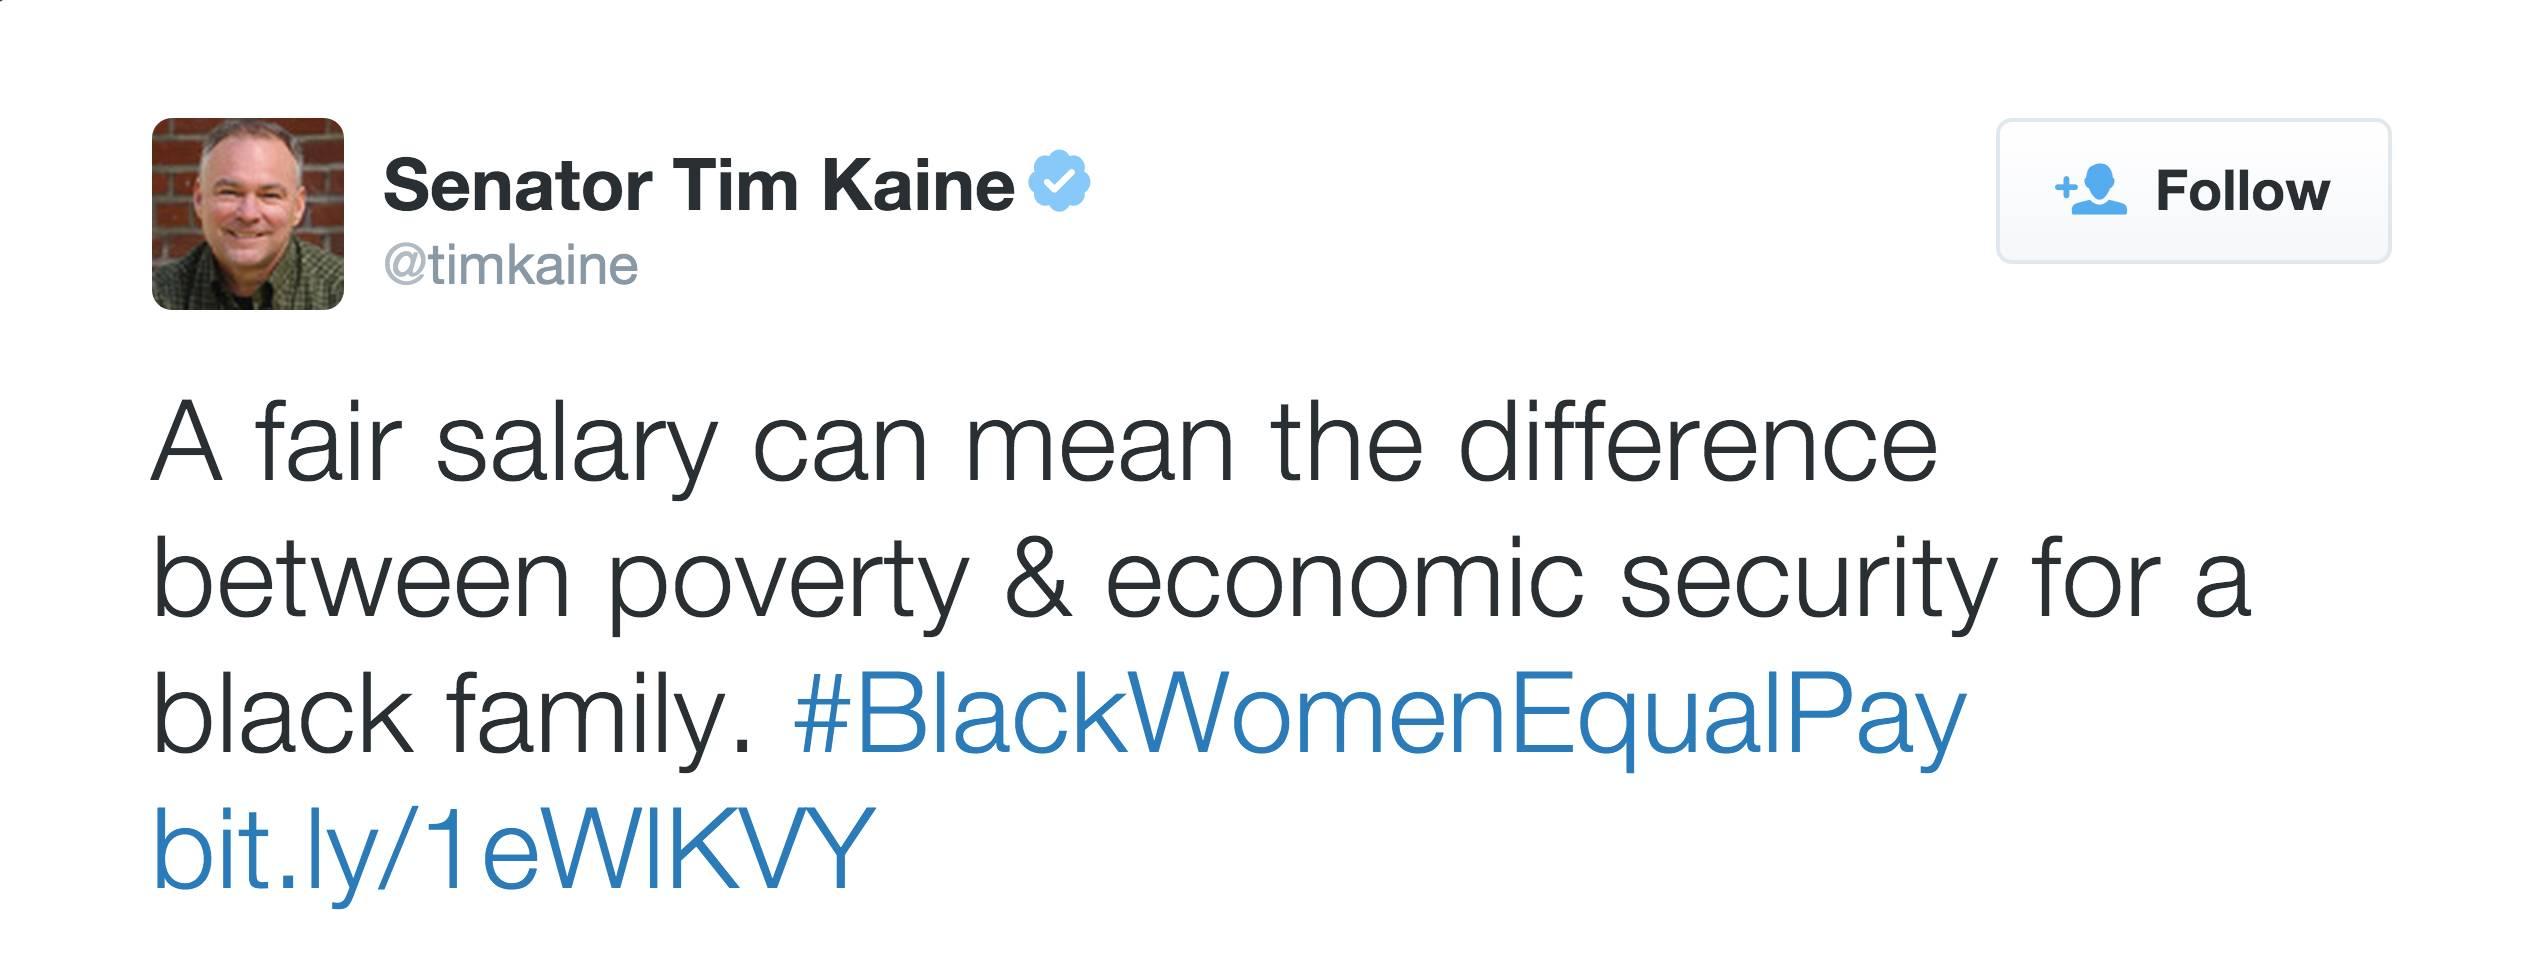 @timkaine - (Photo: Senator Tim Kaine via Twitter)